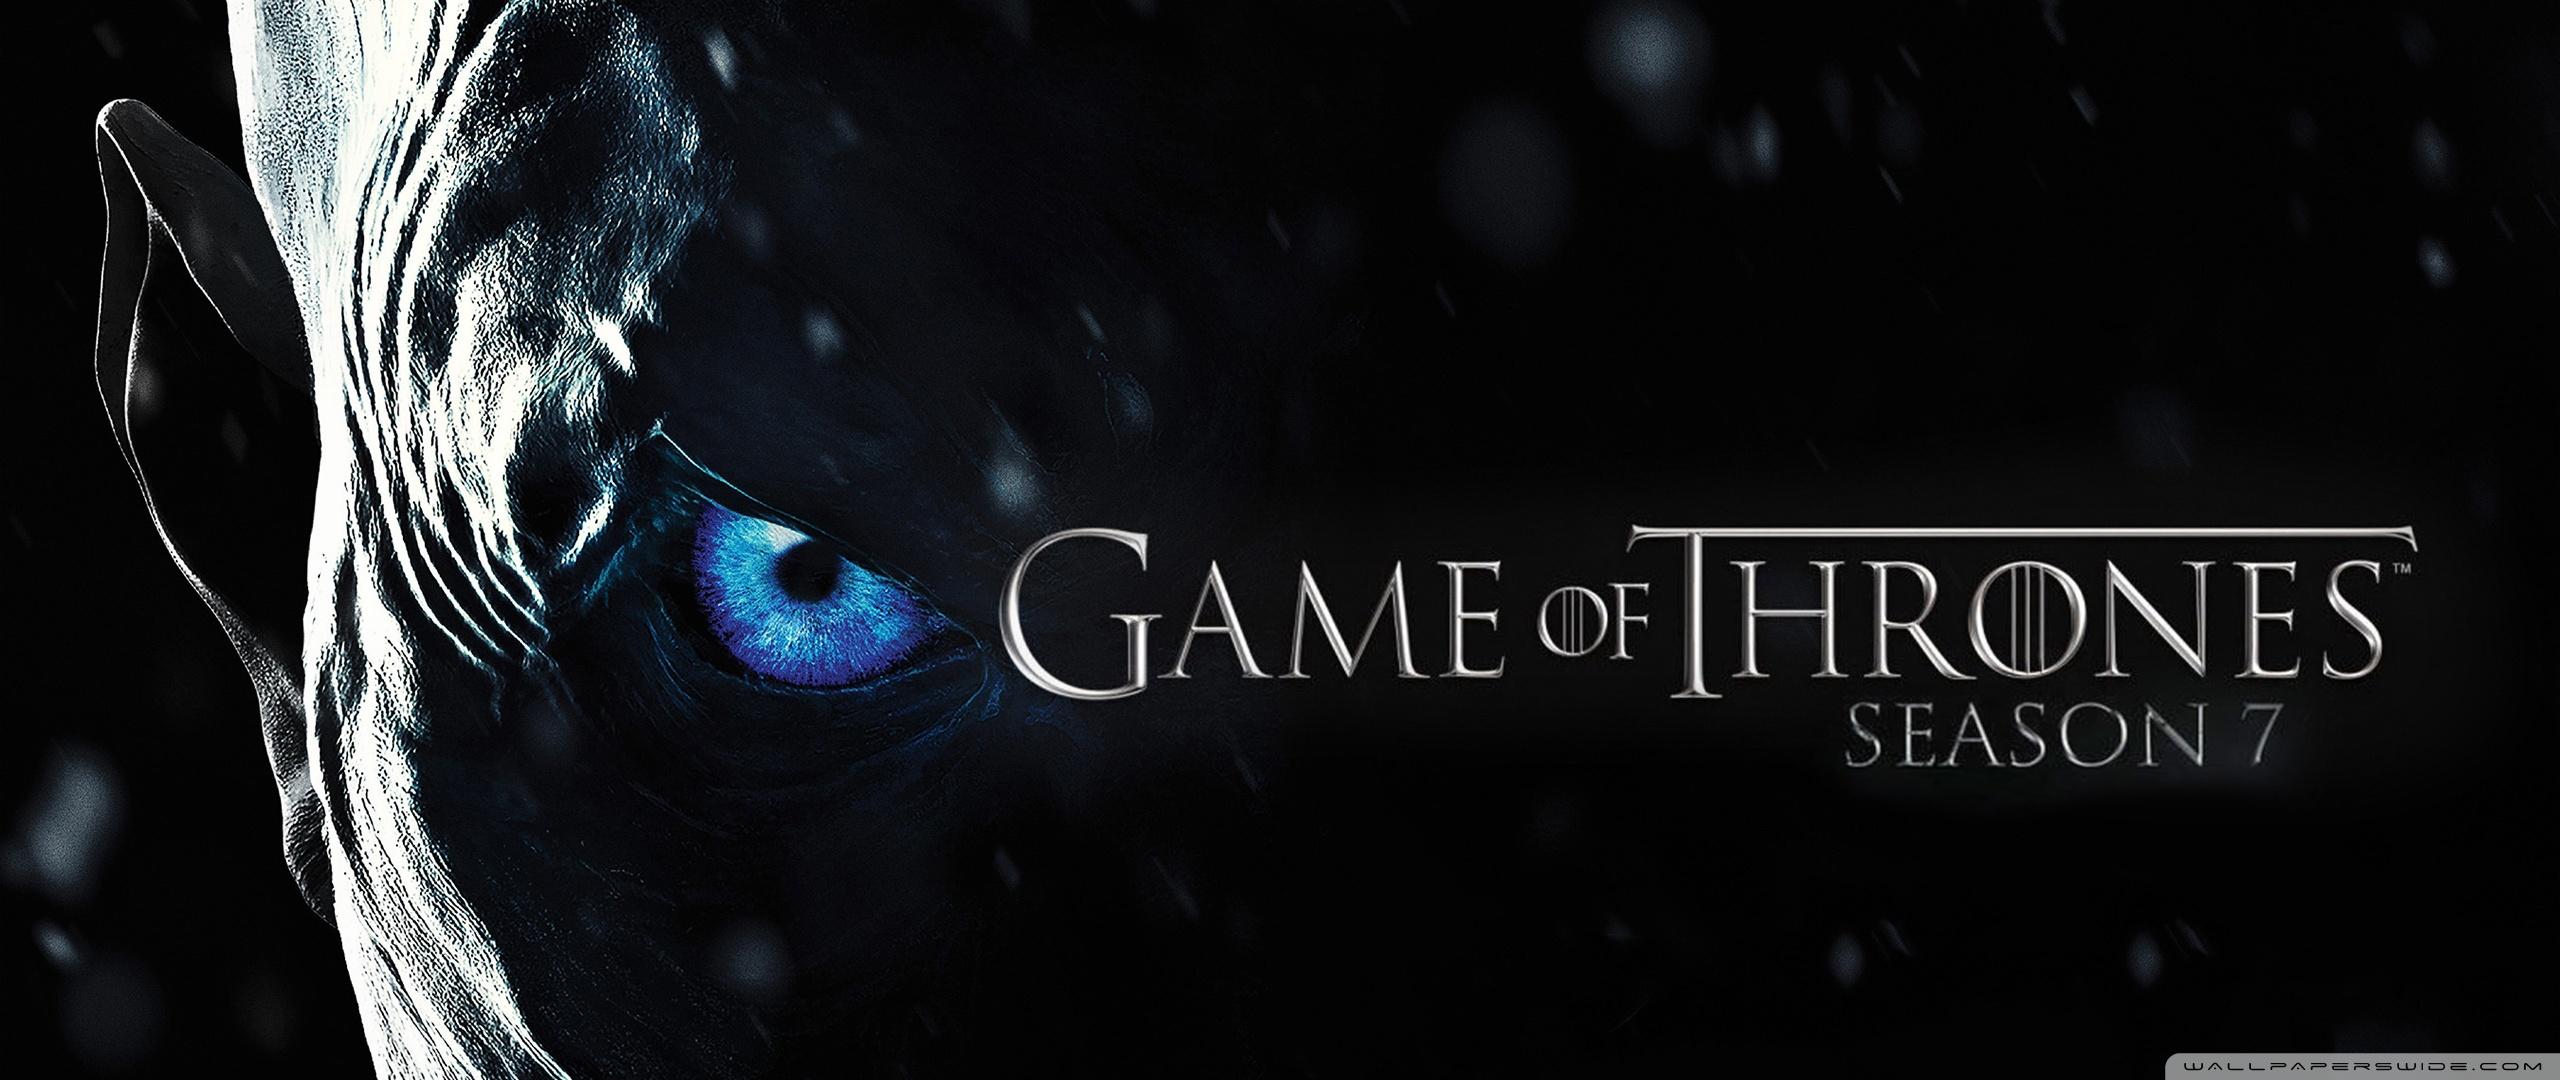 Game Of Thrones Season 7 4K HD Desktop Wallpaper for 4K Ultra 2560x1080